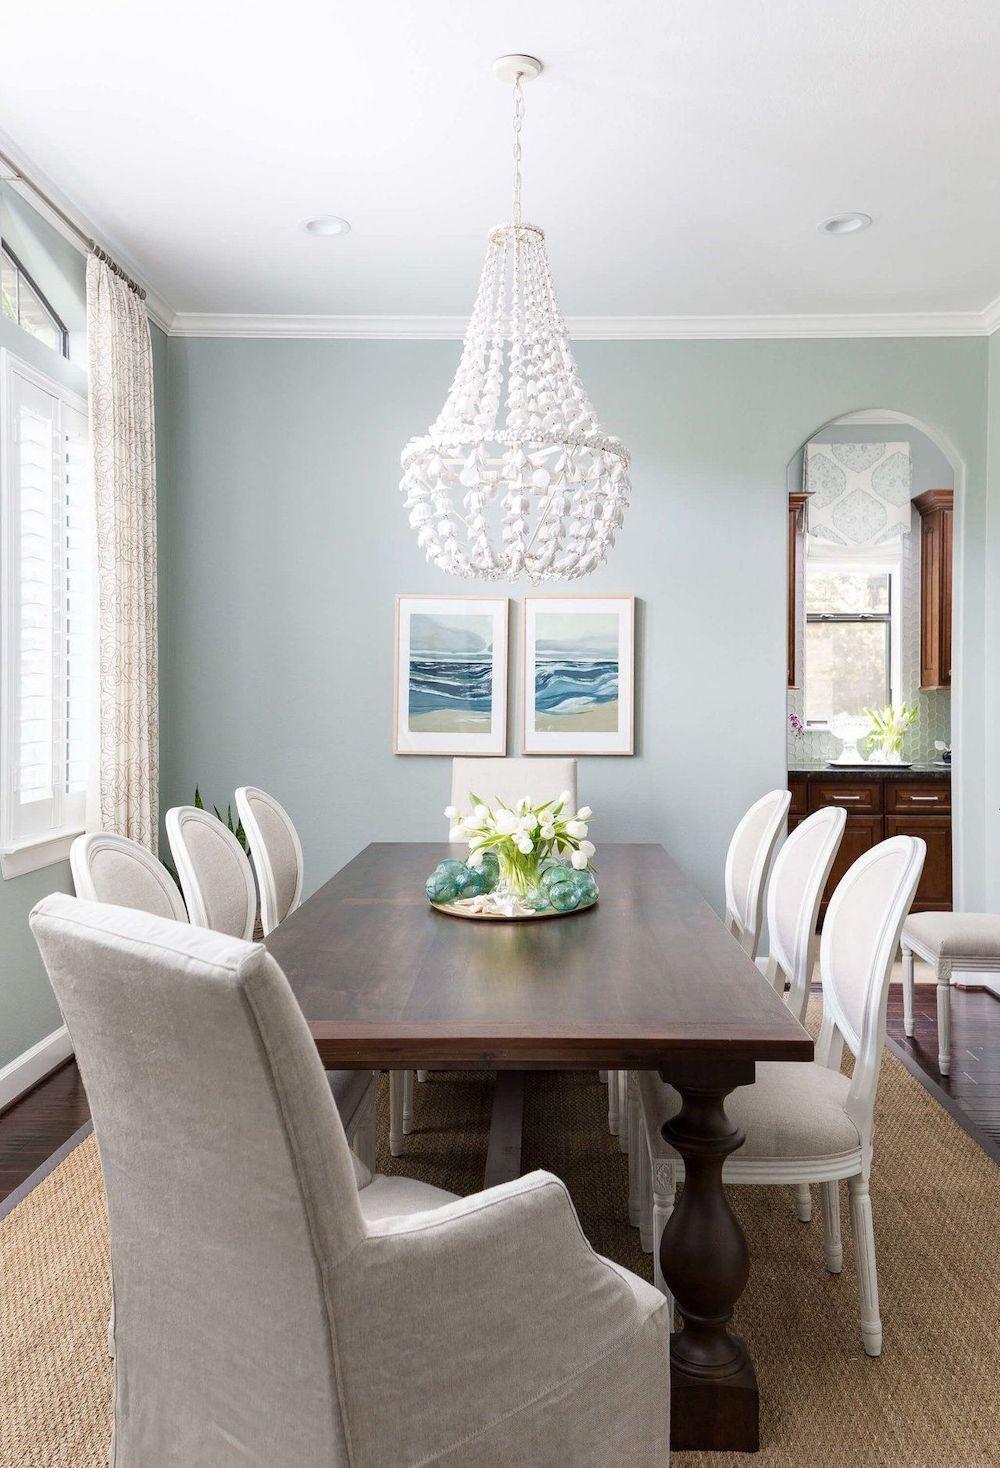 White seashell coastal chandeliers via Carla Aston